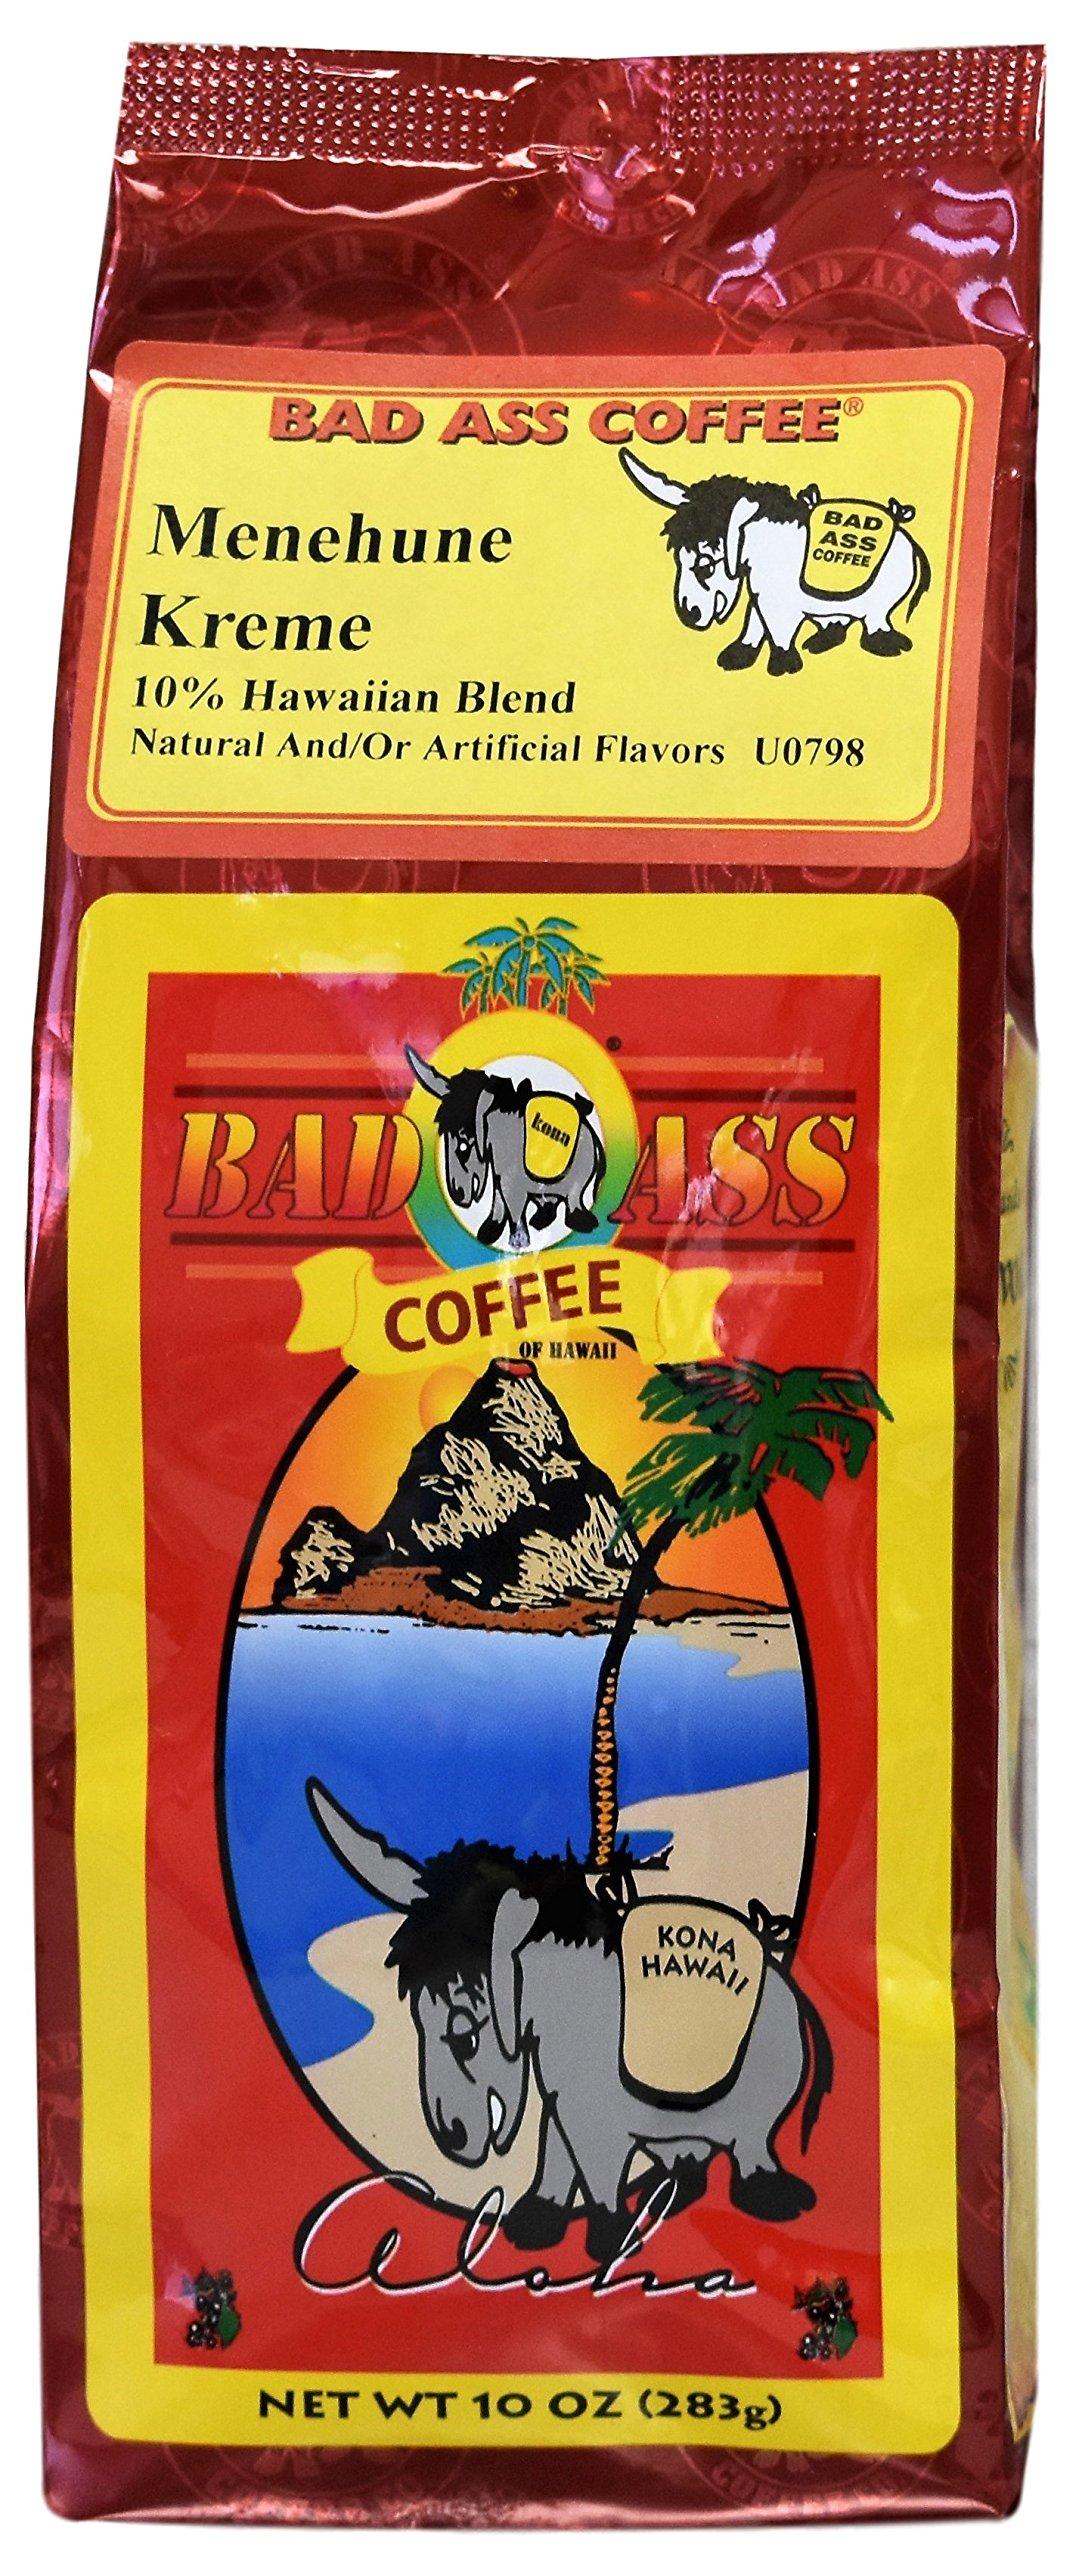 Bad Ass Coffee - Whole Bean Hawaiian Blend Coffee, Menehune Kreme - 10 Ounces